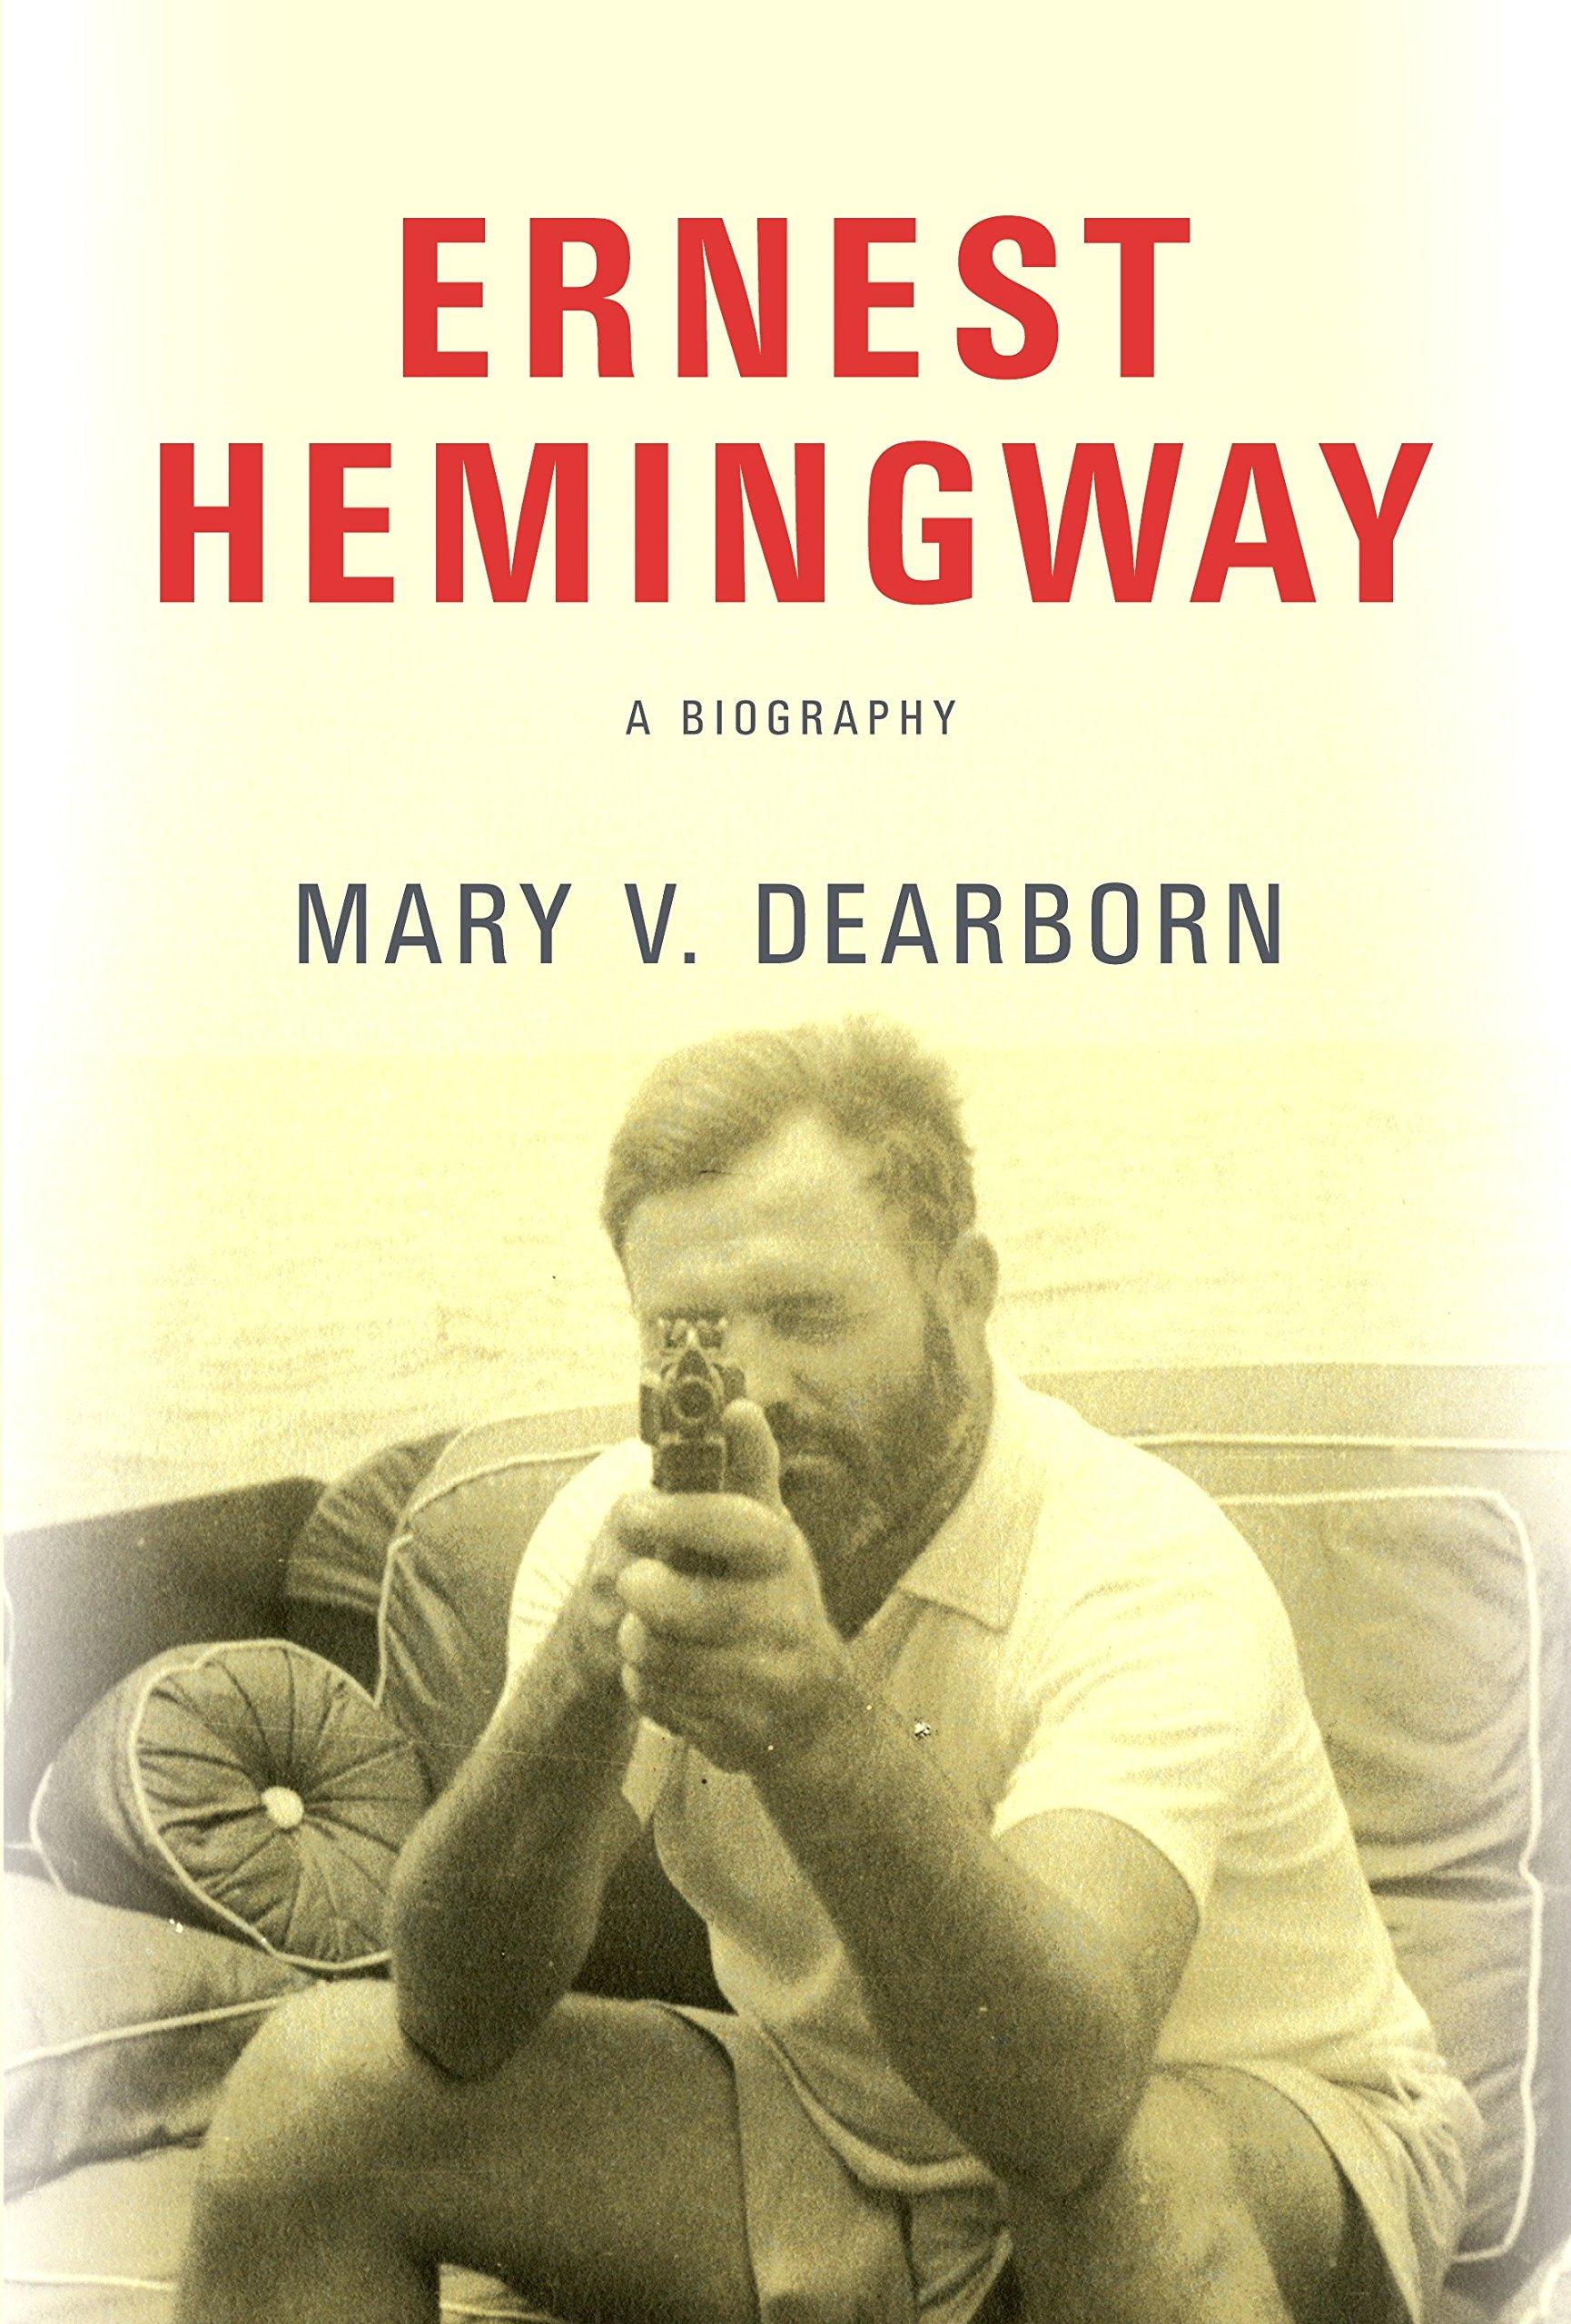 Ernest Hemingway: A Biography: Amazon.es: Mary V. Dearborn: Libros ...